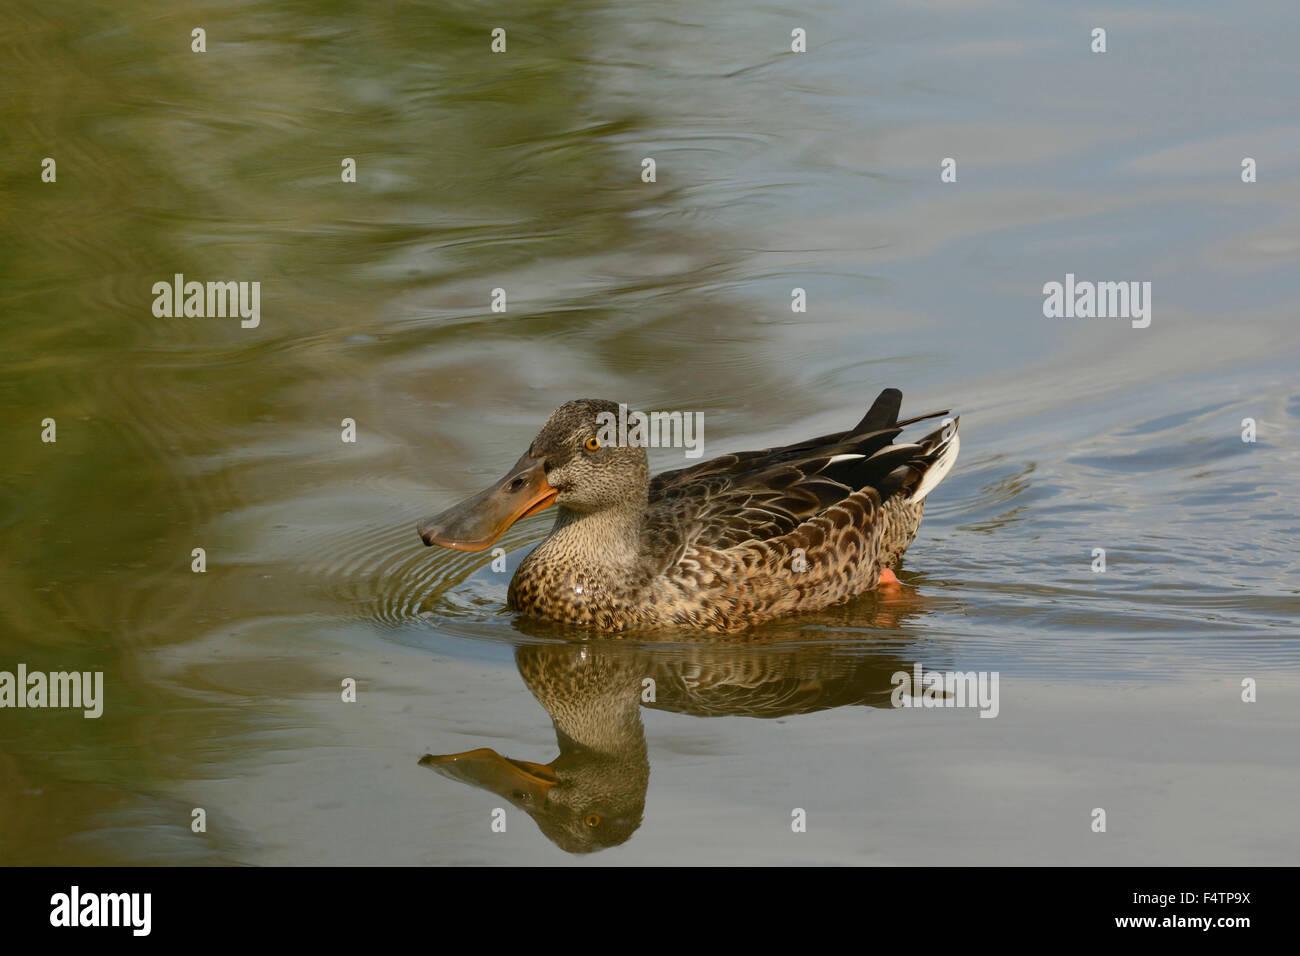 European shoveler, Anas clypeata, Anatidae, duck, bird, animal, marsh of Neerach, nature reserve, canton of Zurich, - Stock Image